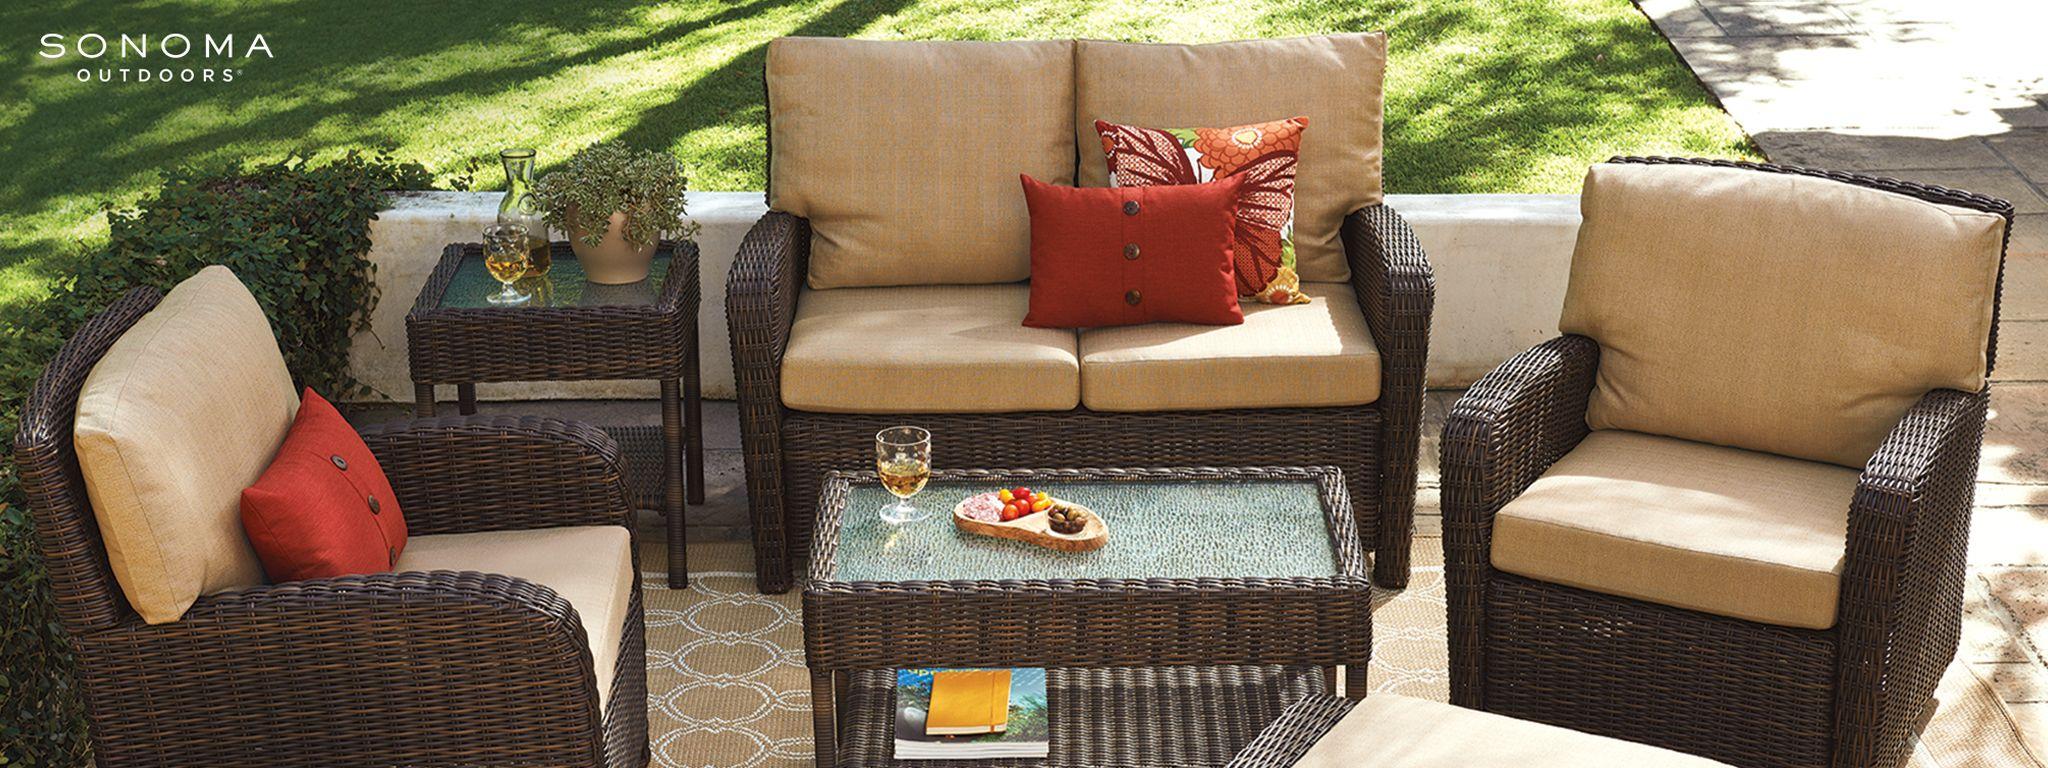 Kohls Patio Furniture at Home and Interior Design Ideas